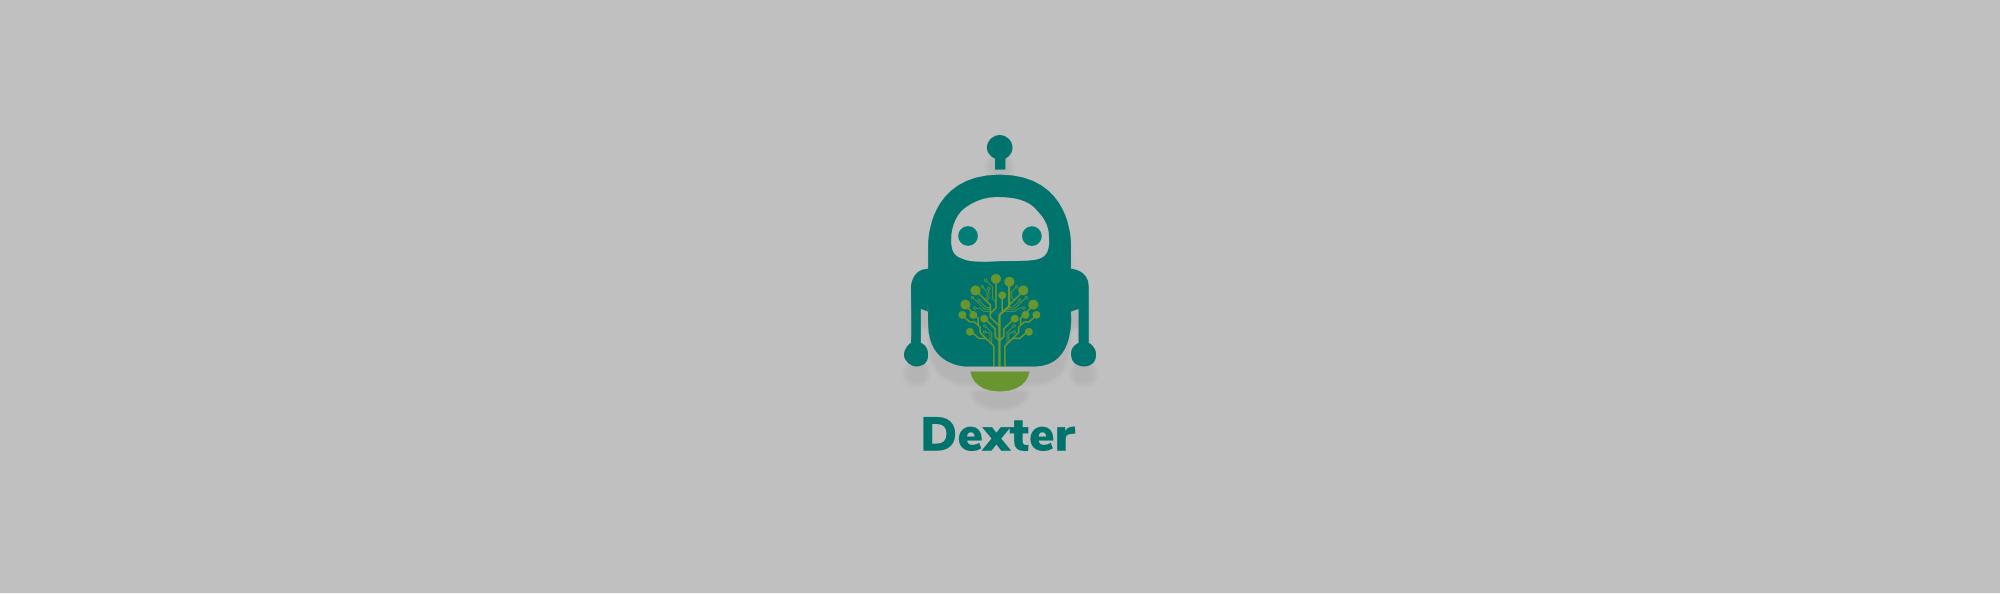 Meet Dexter – Our Fast, Friendly Auto Bot